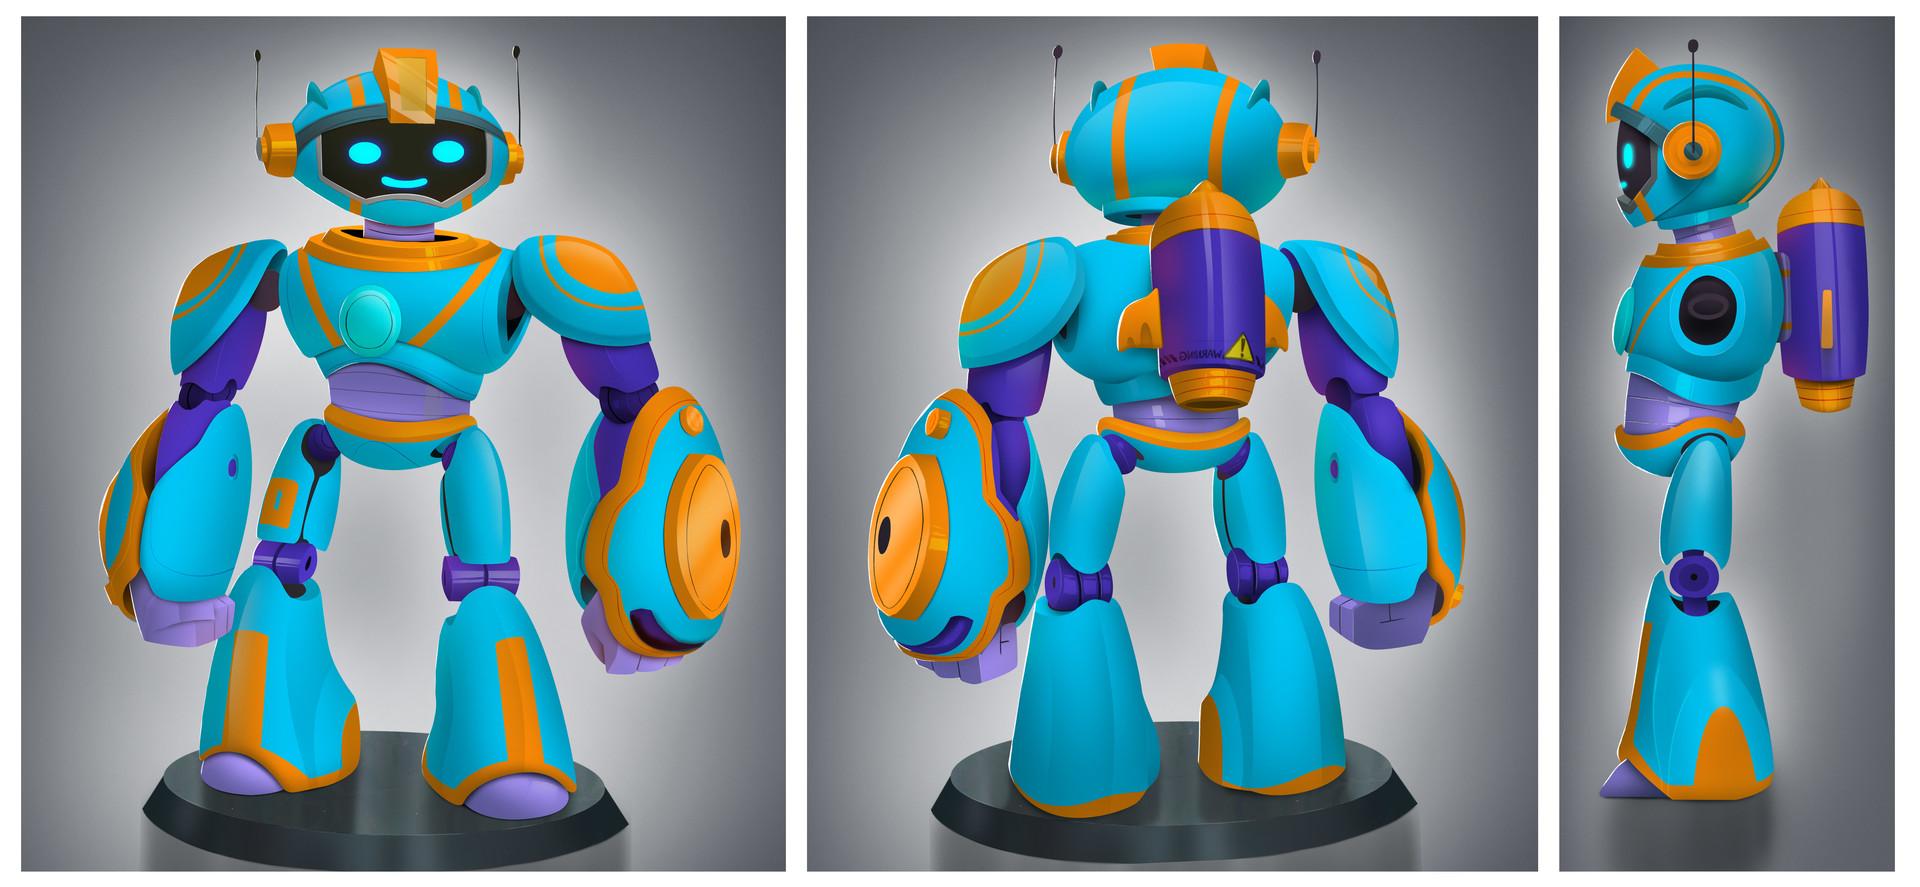 Rayner alencar robot turn around color